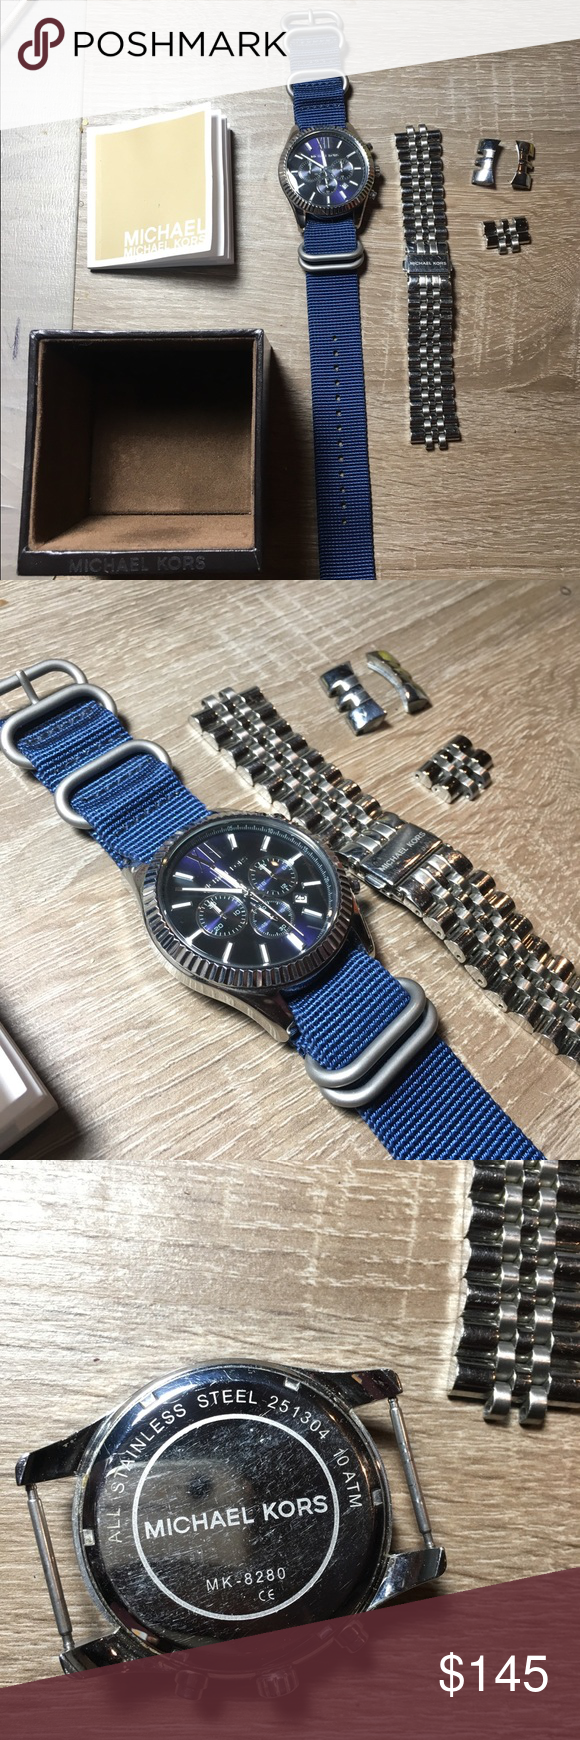 Michael kors lexington menus chronograph watch just had battery